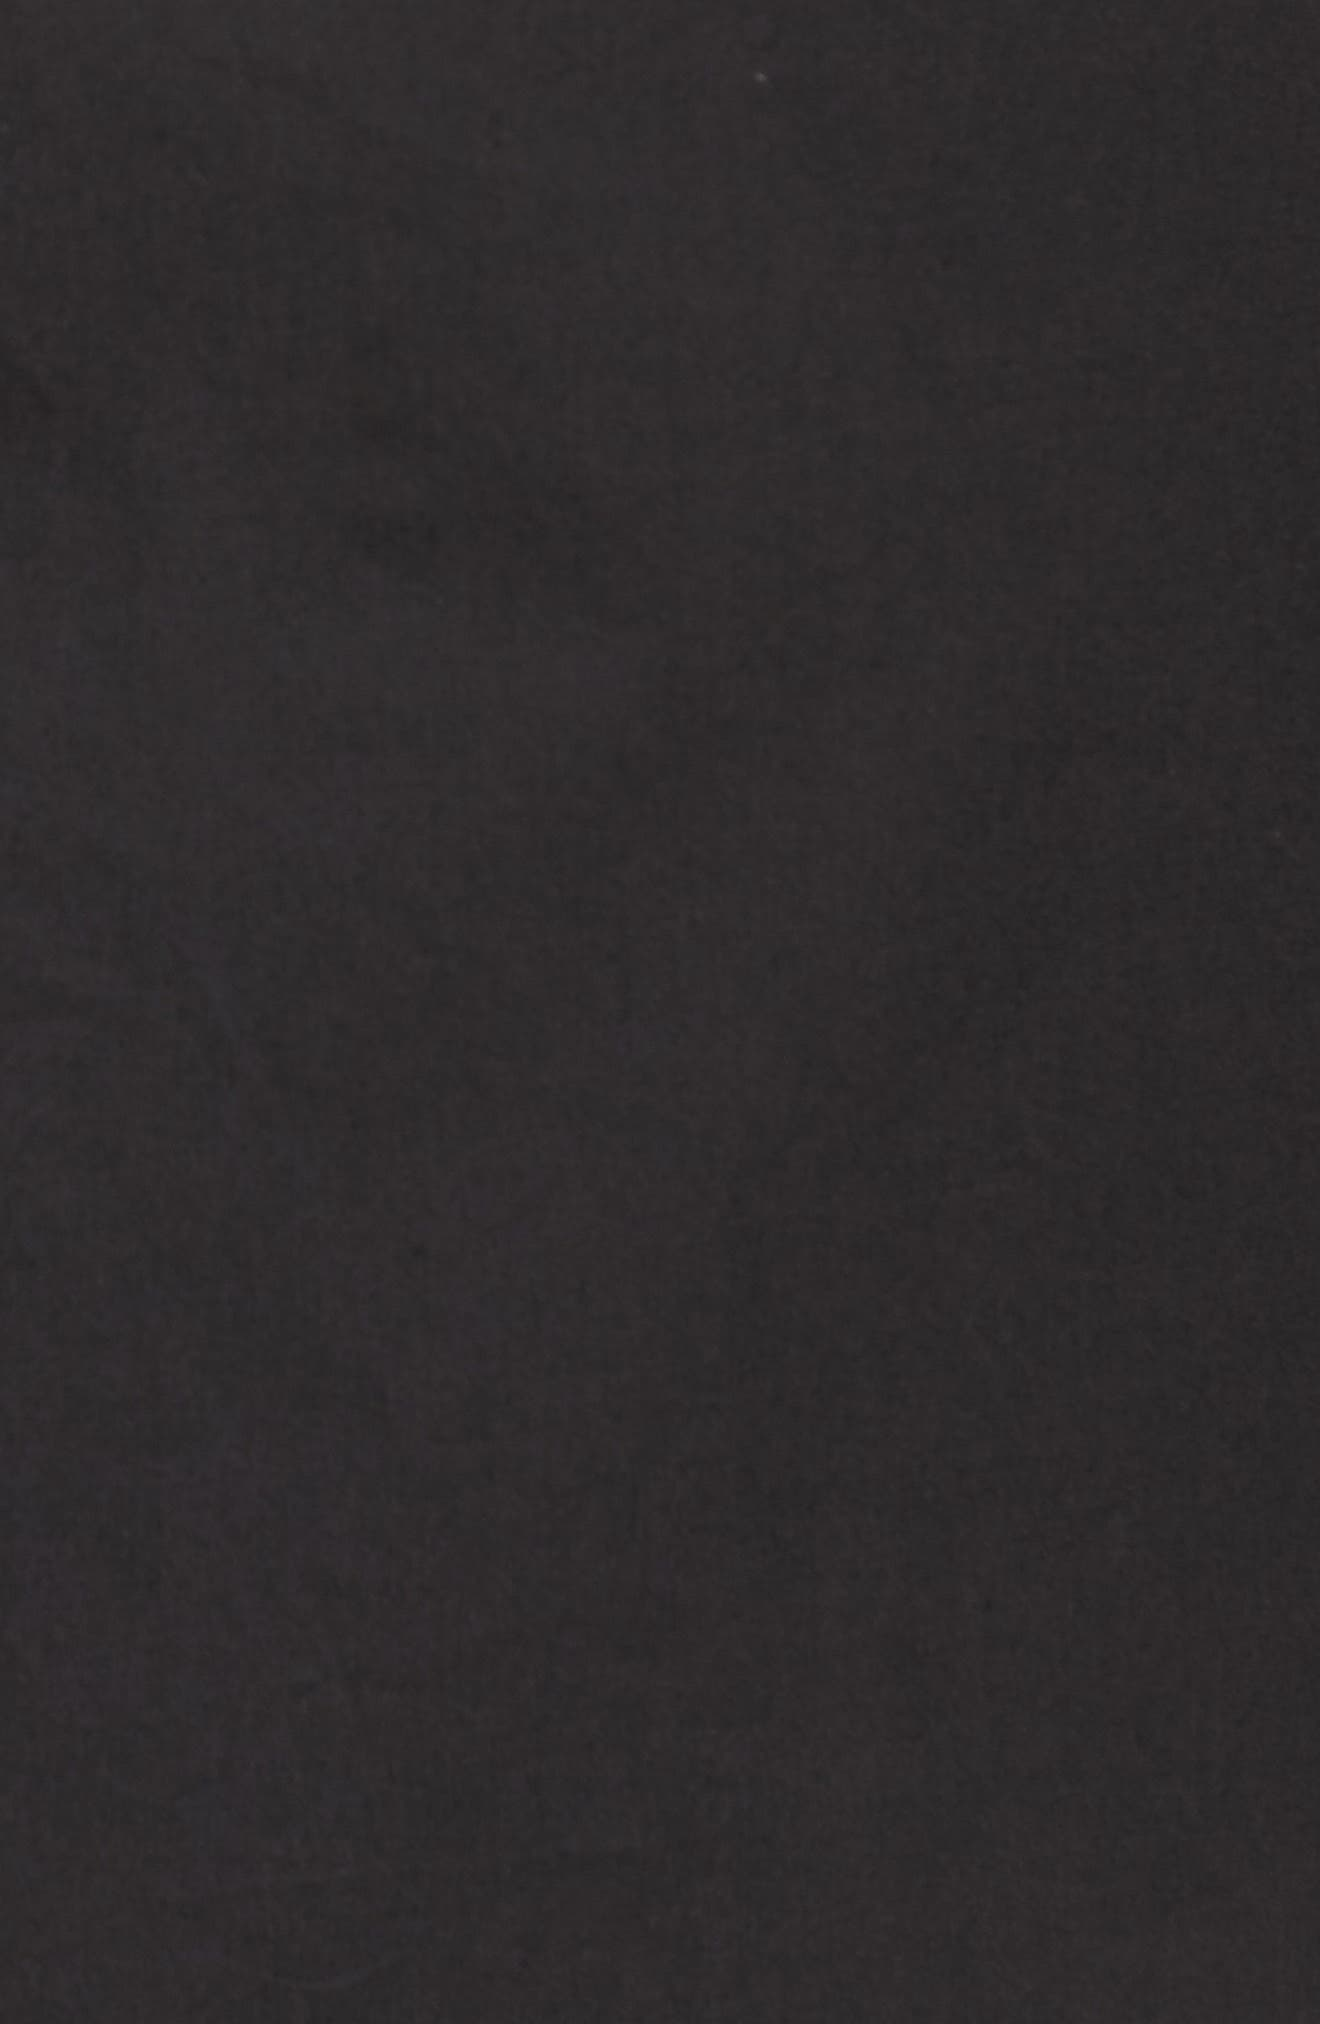 One-Shoulder Ruffle Dress,                             Alternate thumbnail 6, color,                             001